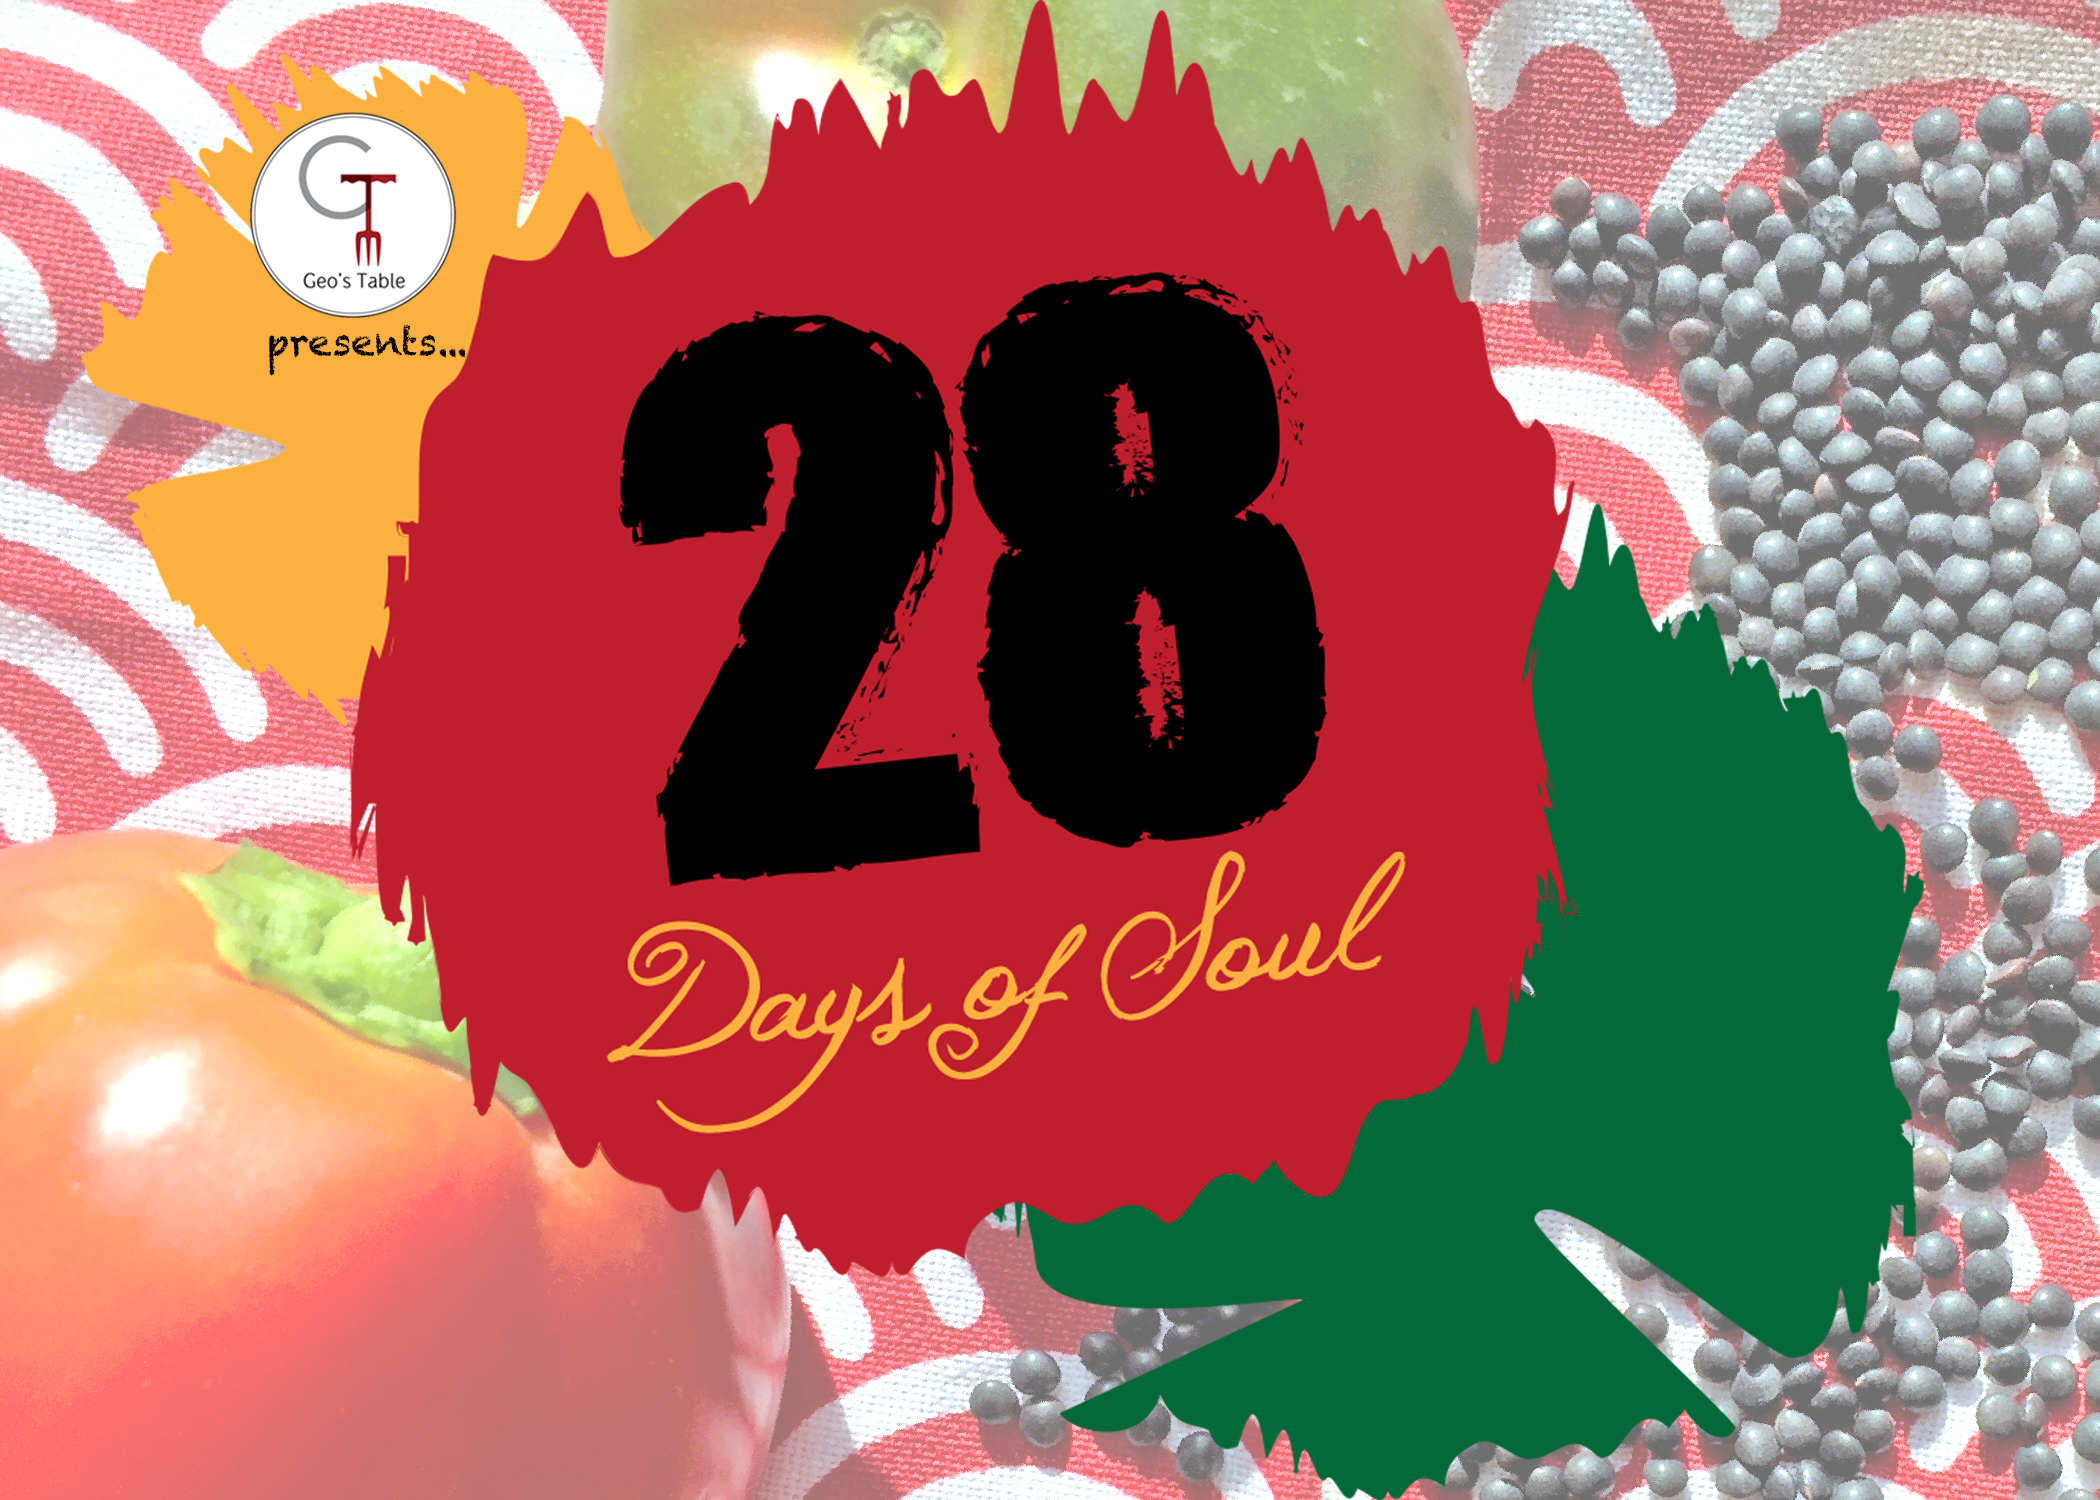 28 Days of Soul